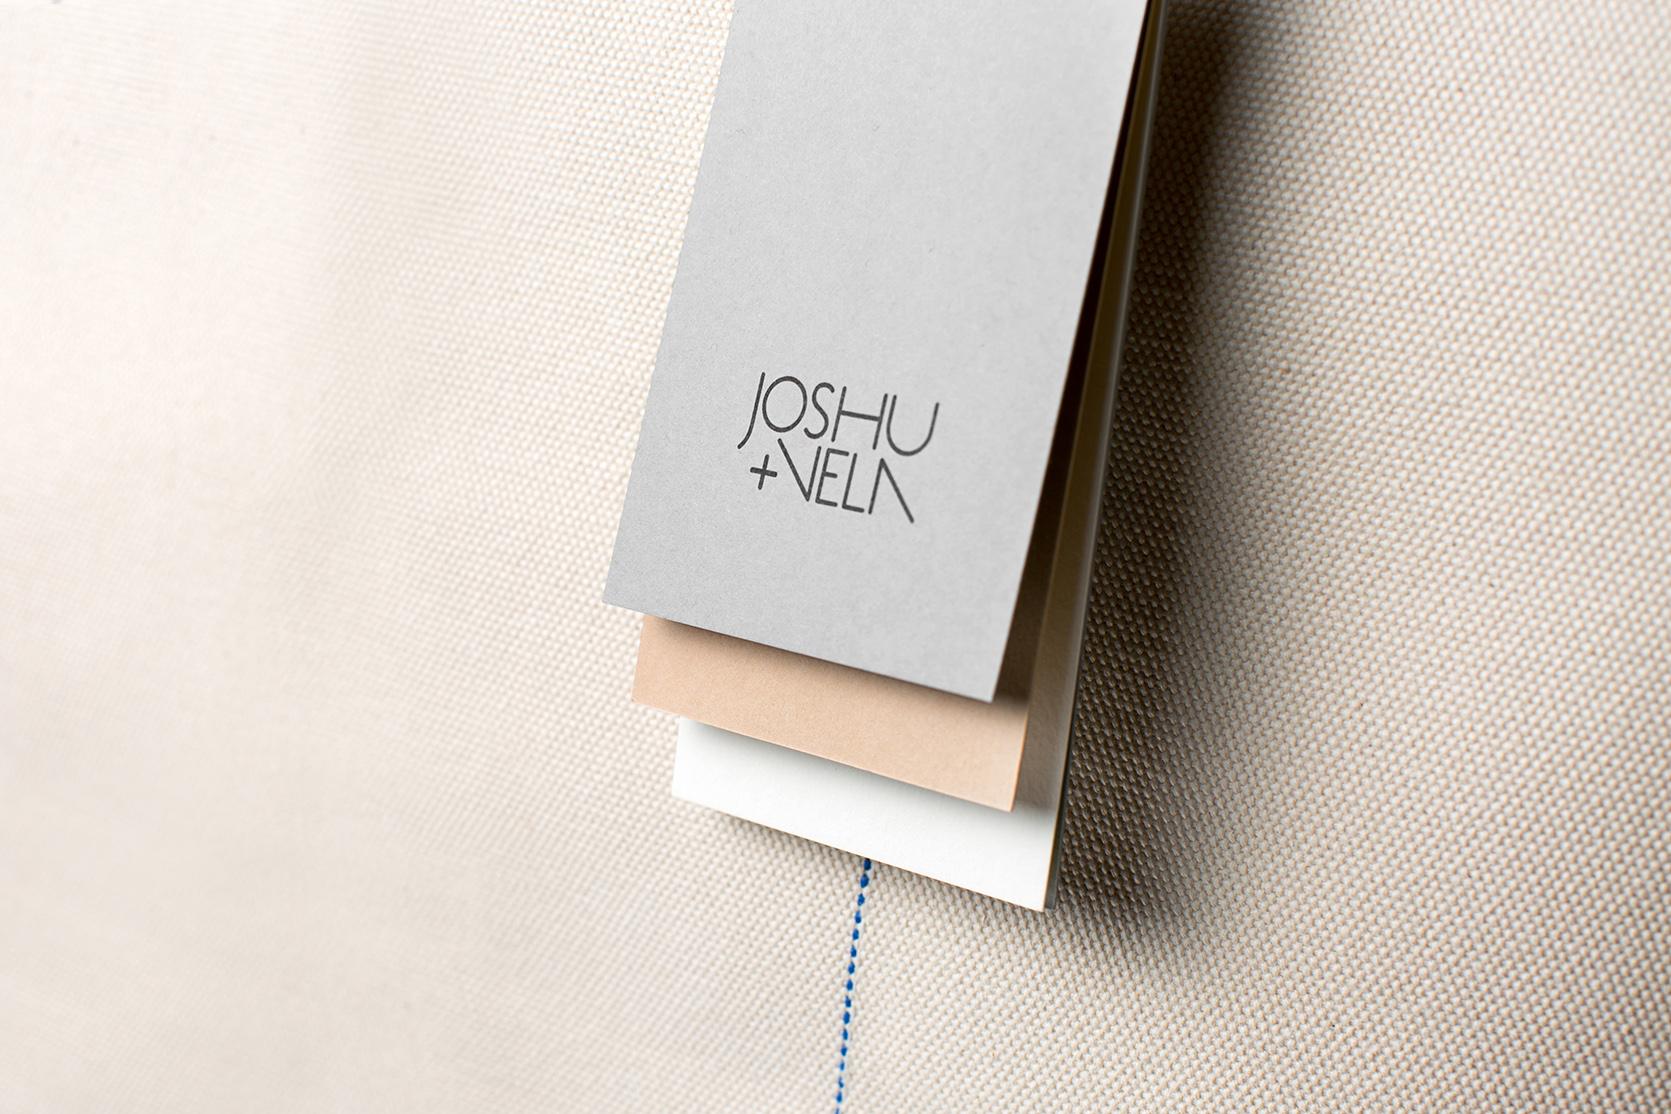 Julia-Kostreva-Studio-Branding-Joshu-Vela--Letterpress-Hangtags-Tote-Cotton-2.jpg